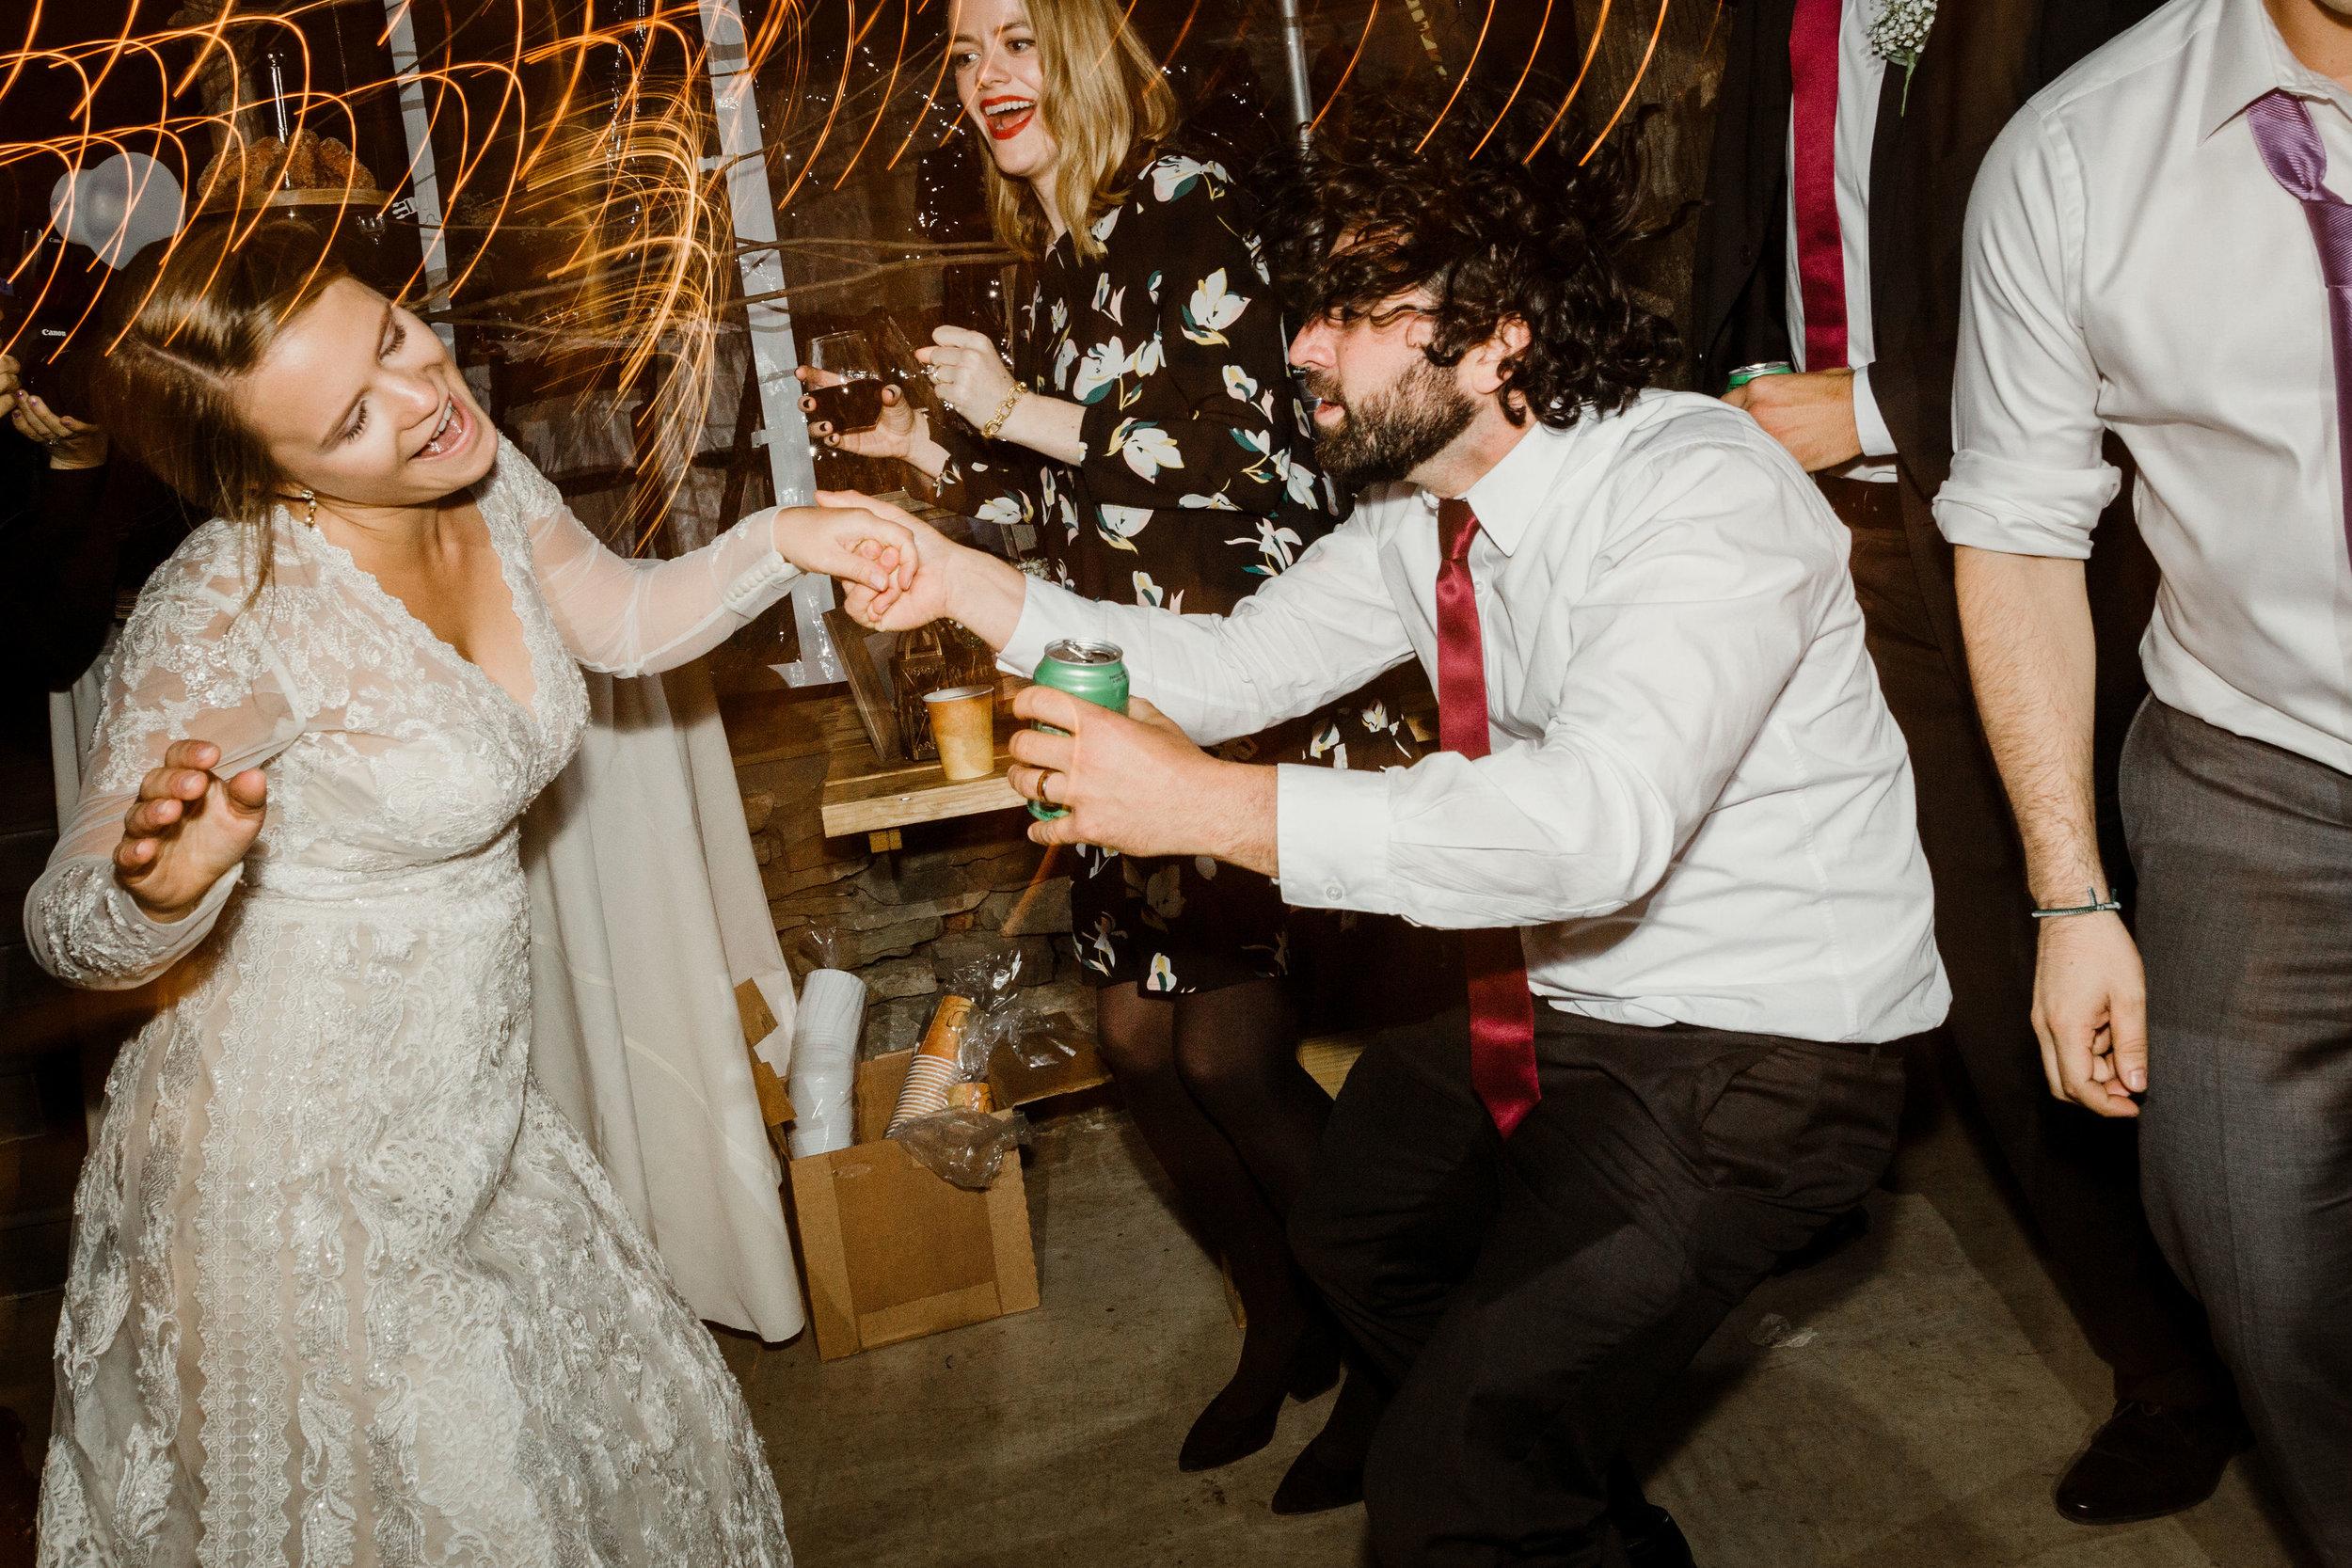 young-love-media-rustic-fall-autumn-wedding-emmerich-tree-farm-hudson-valley-warwick-new-york-reception-364.jpg